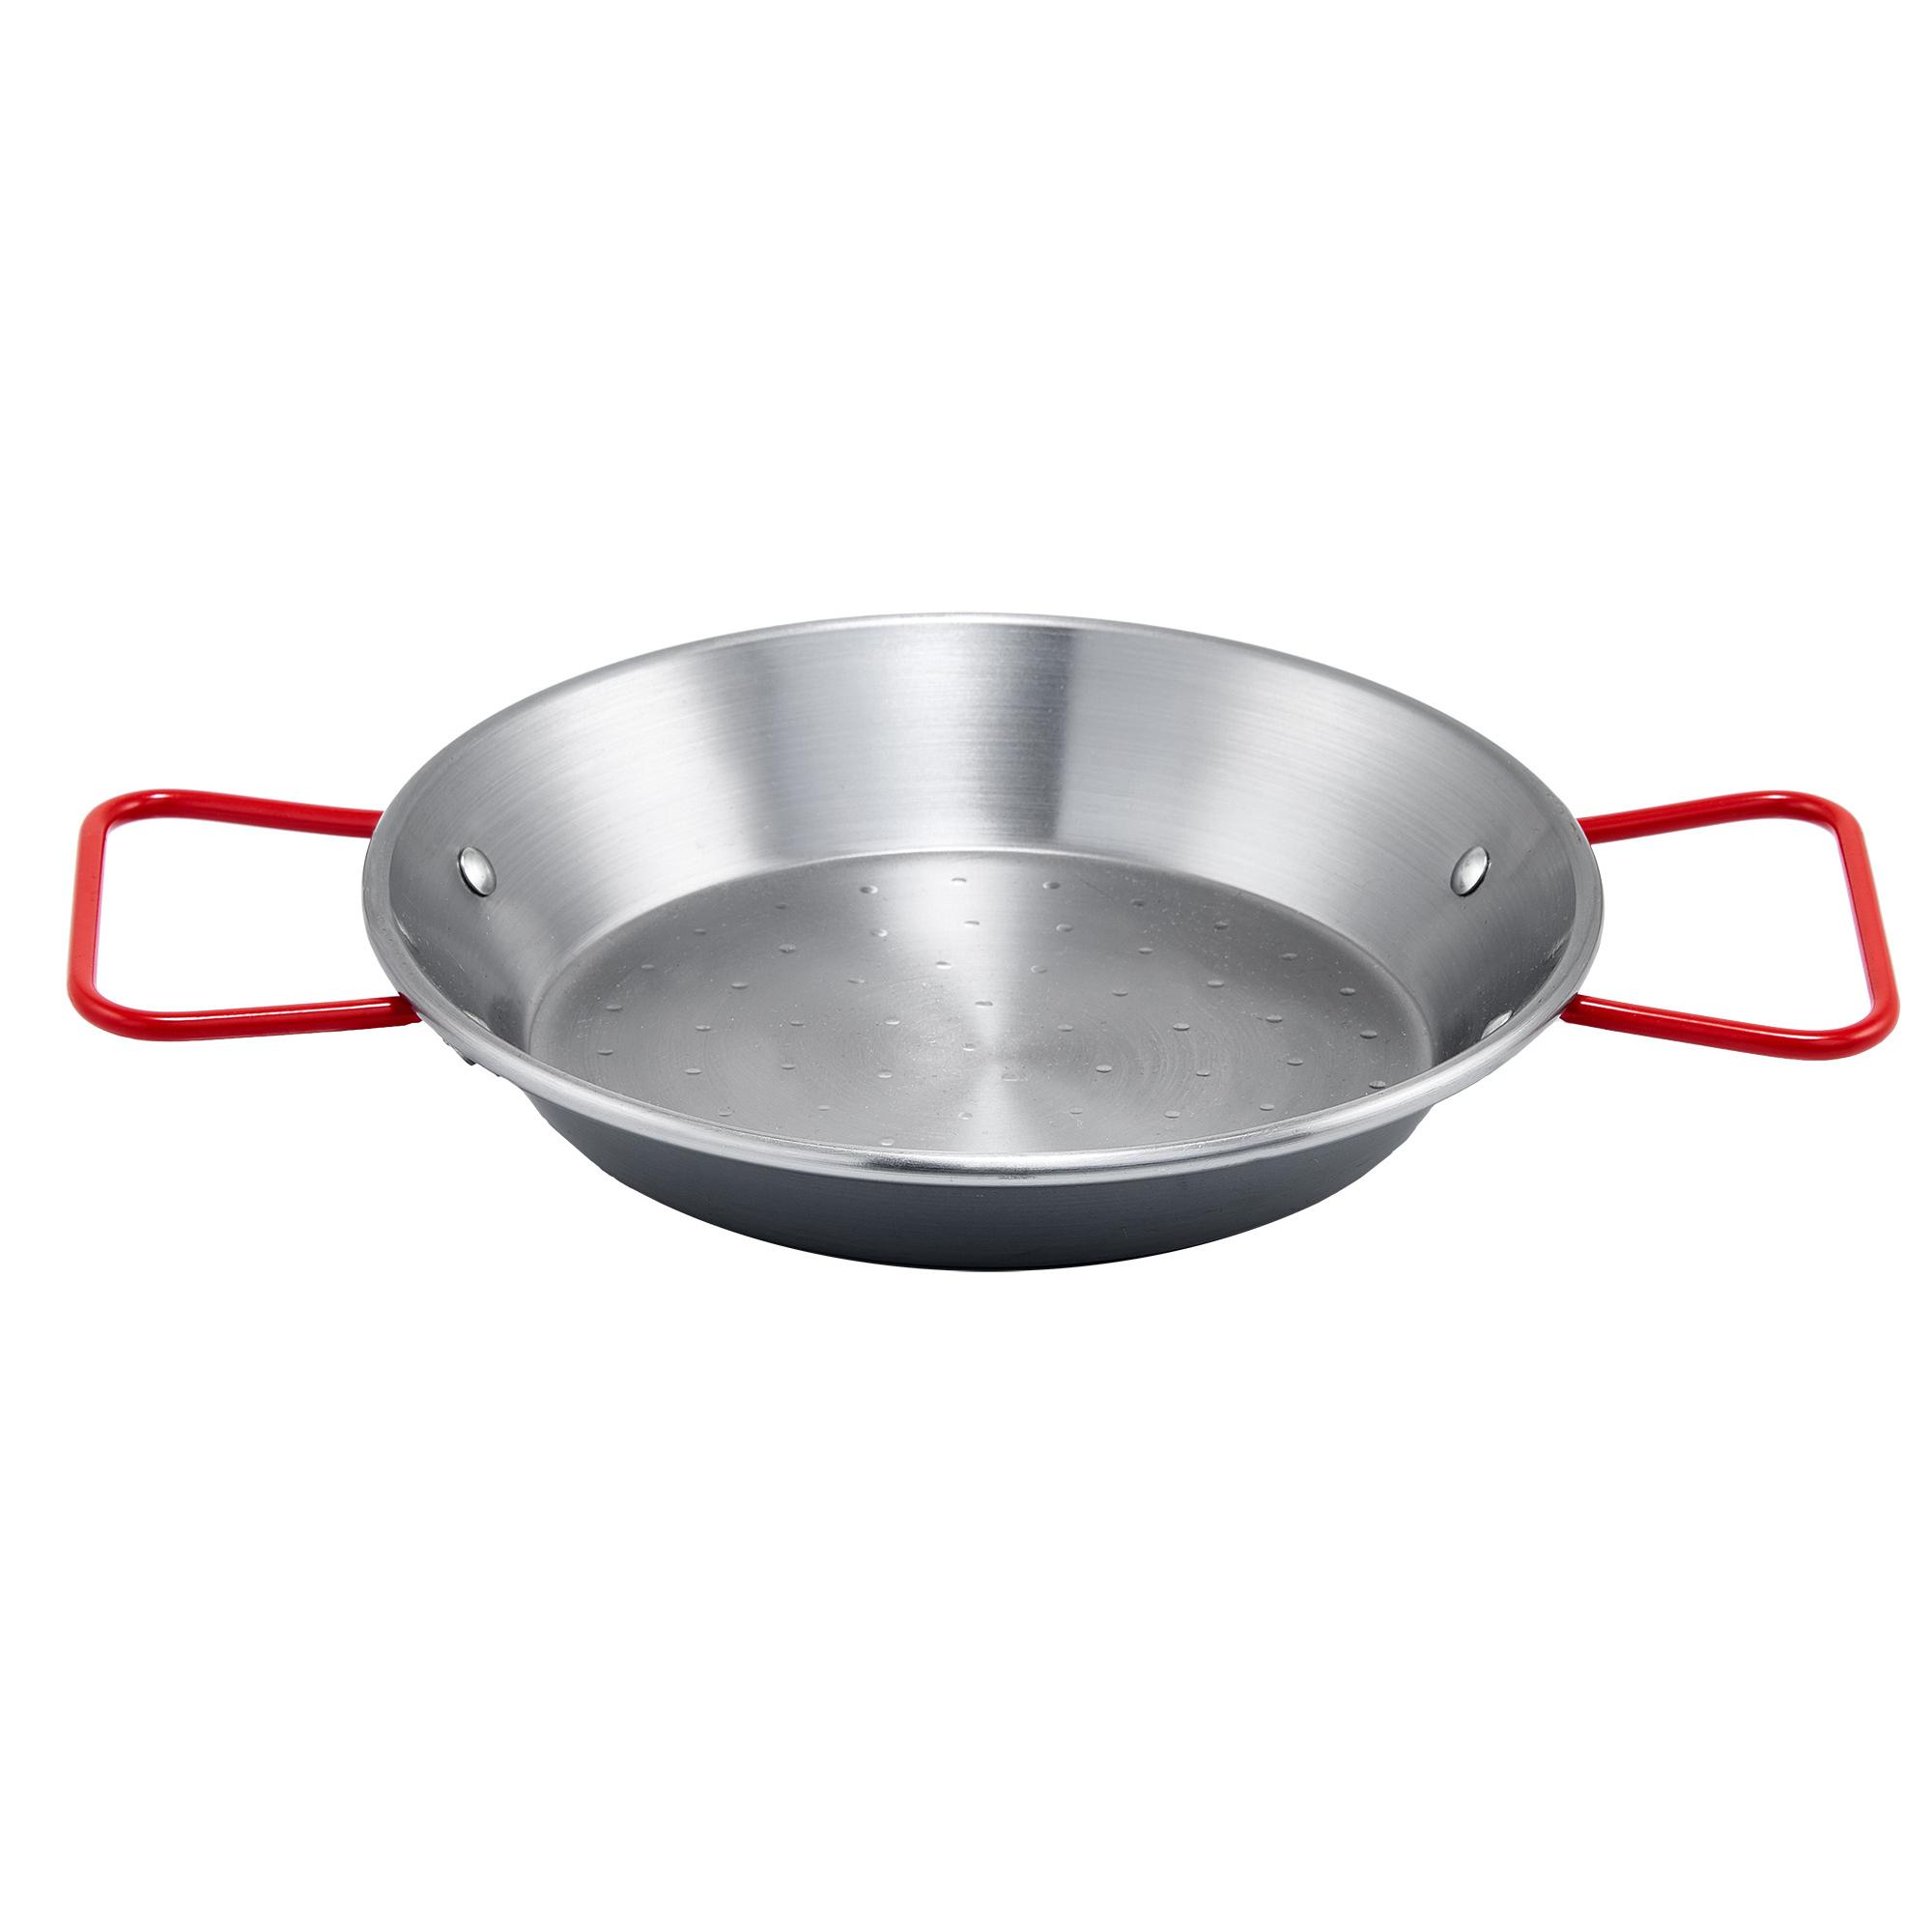 Winco CSPP-14 paella pan